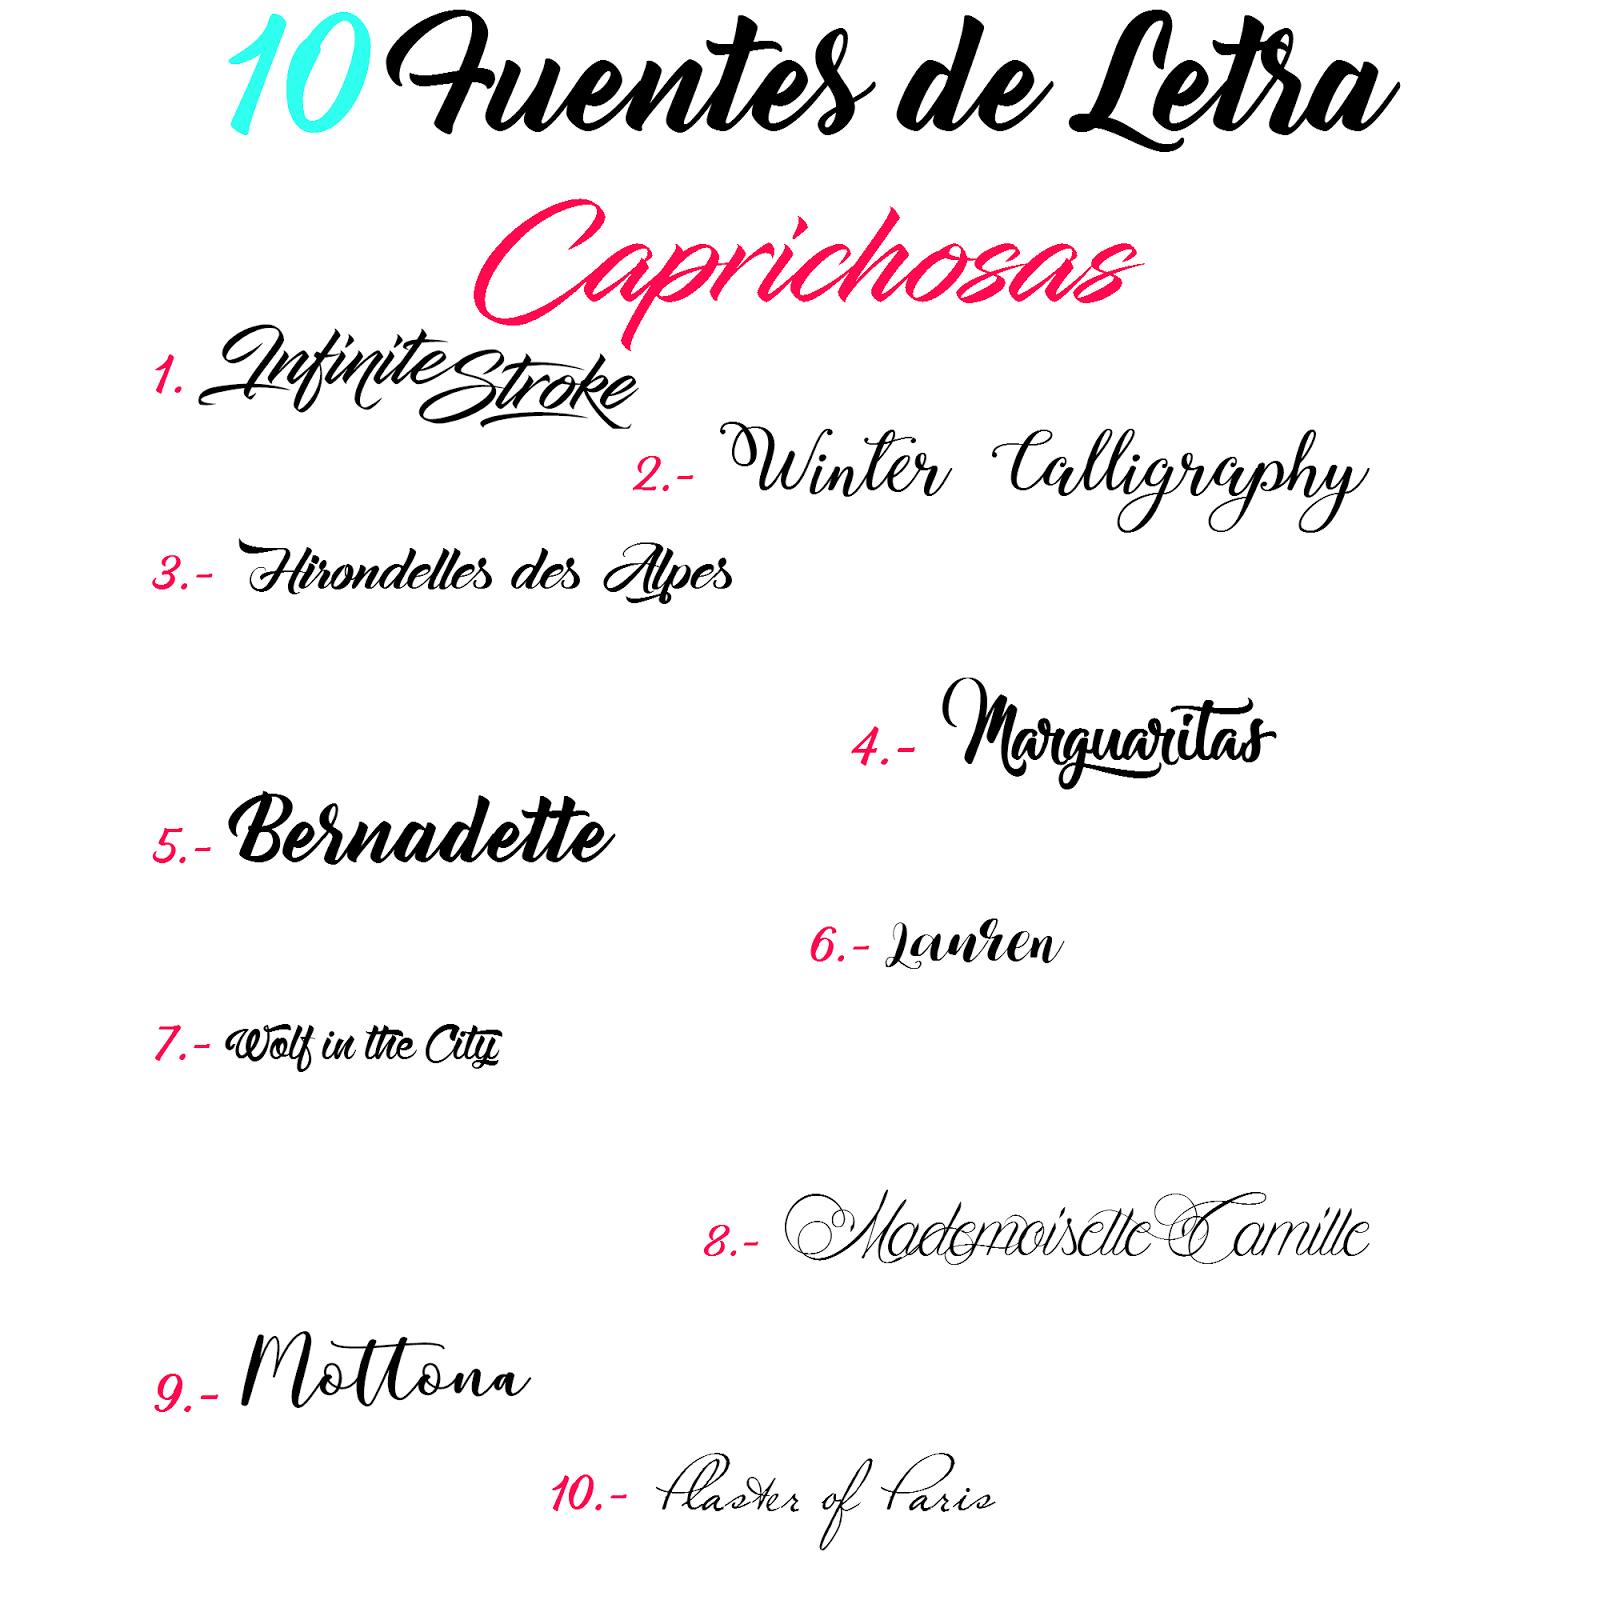 Pitis And Lilus 10 Tipos De Fuentes De Letra Tipografias